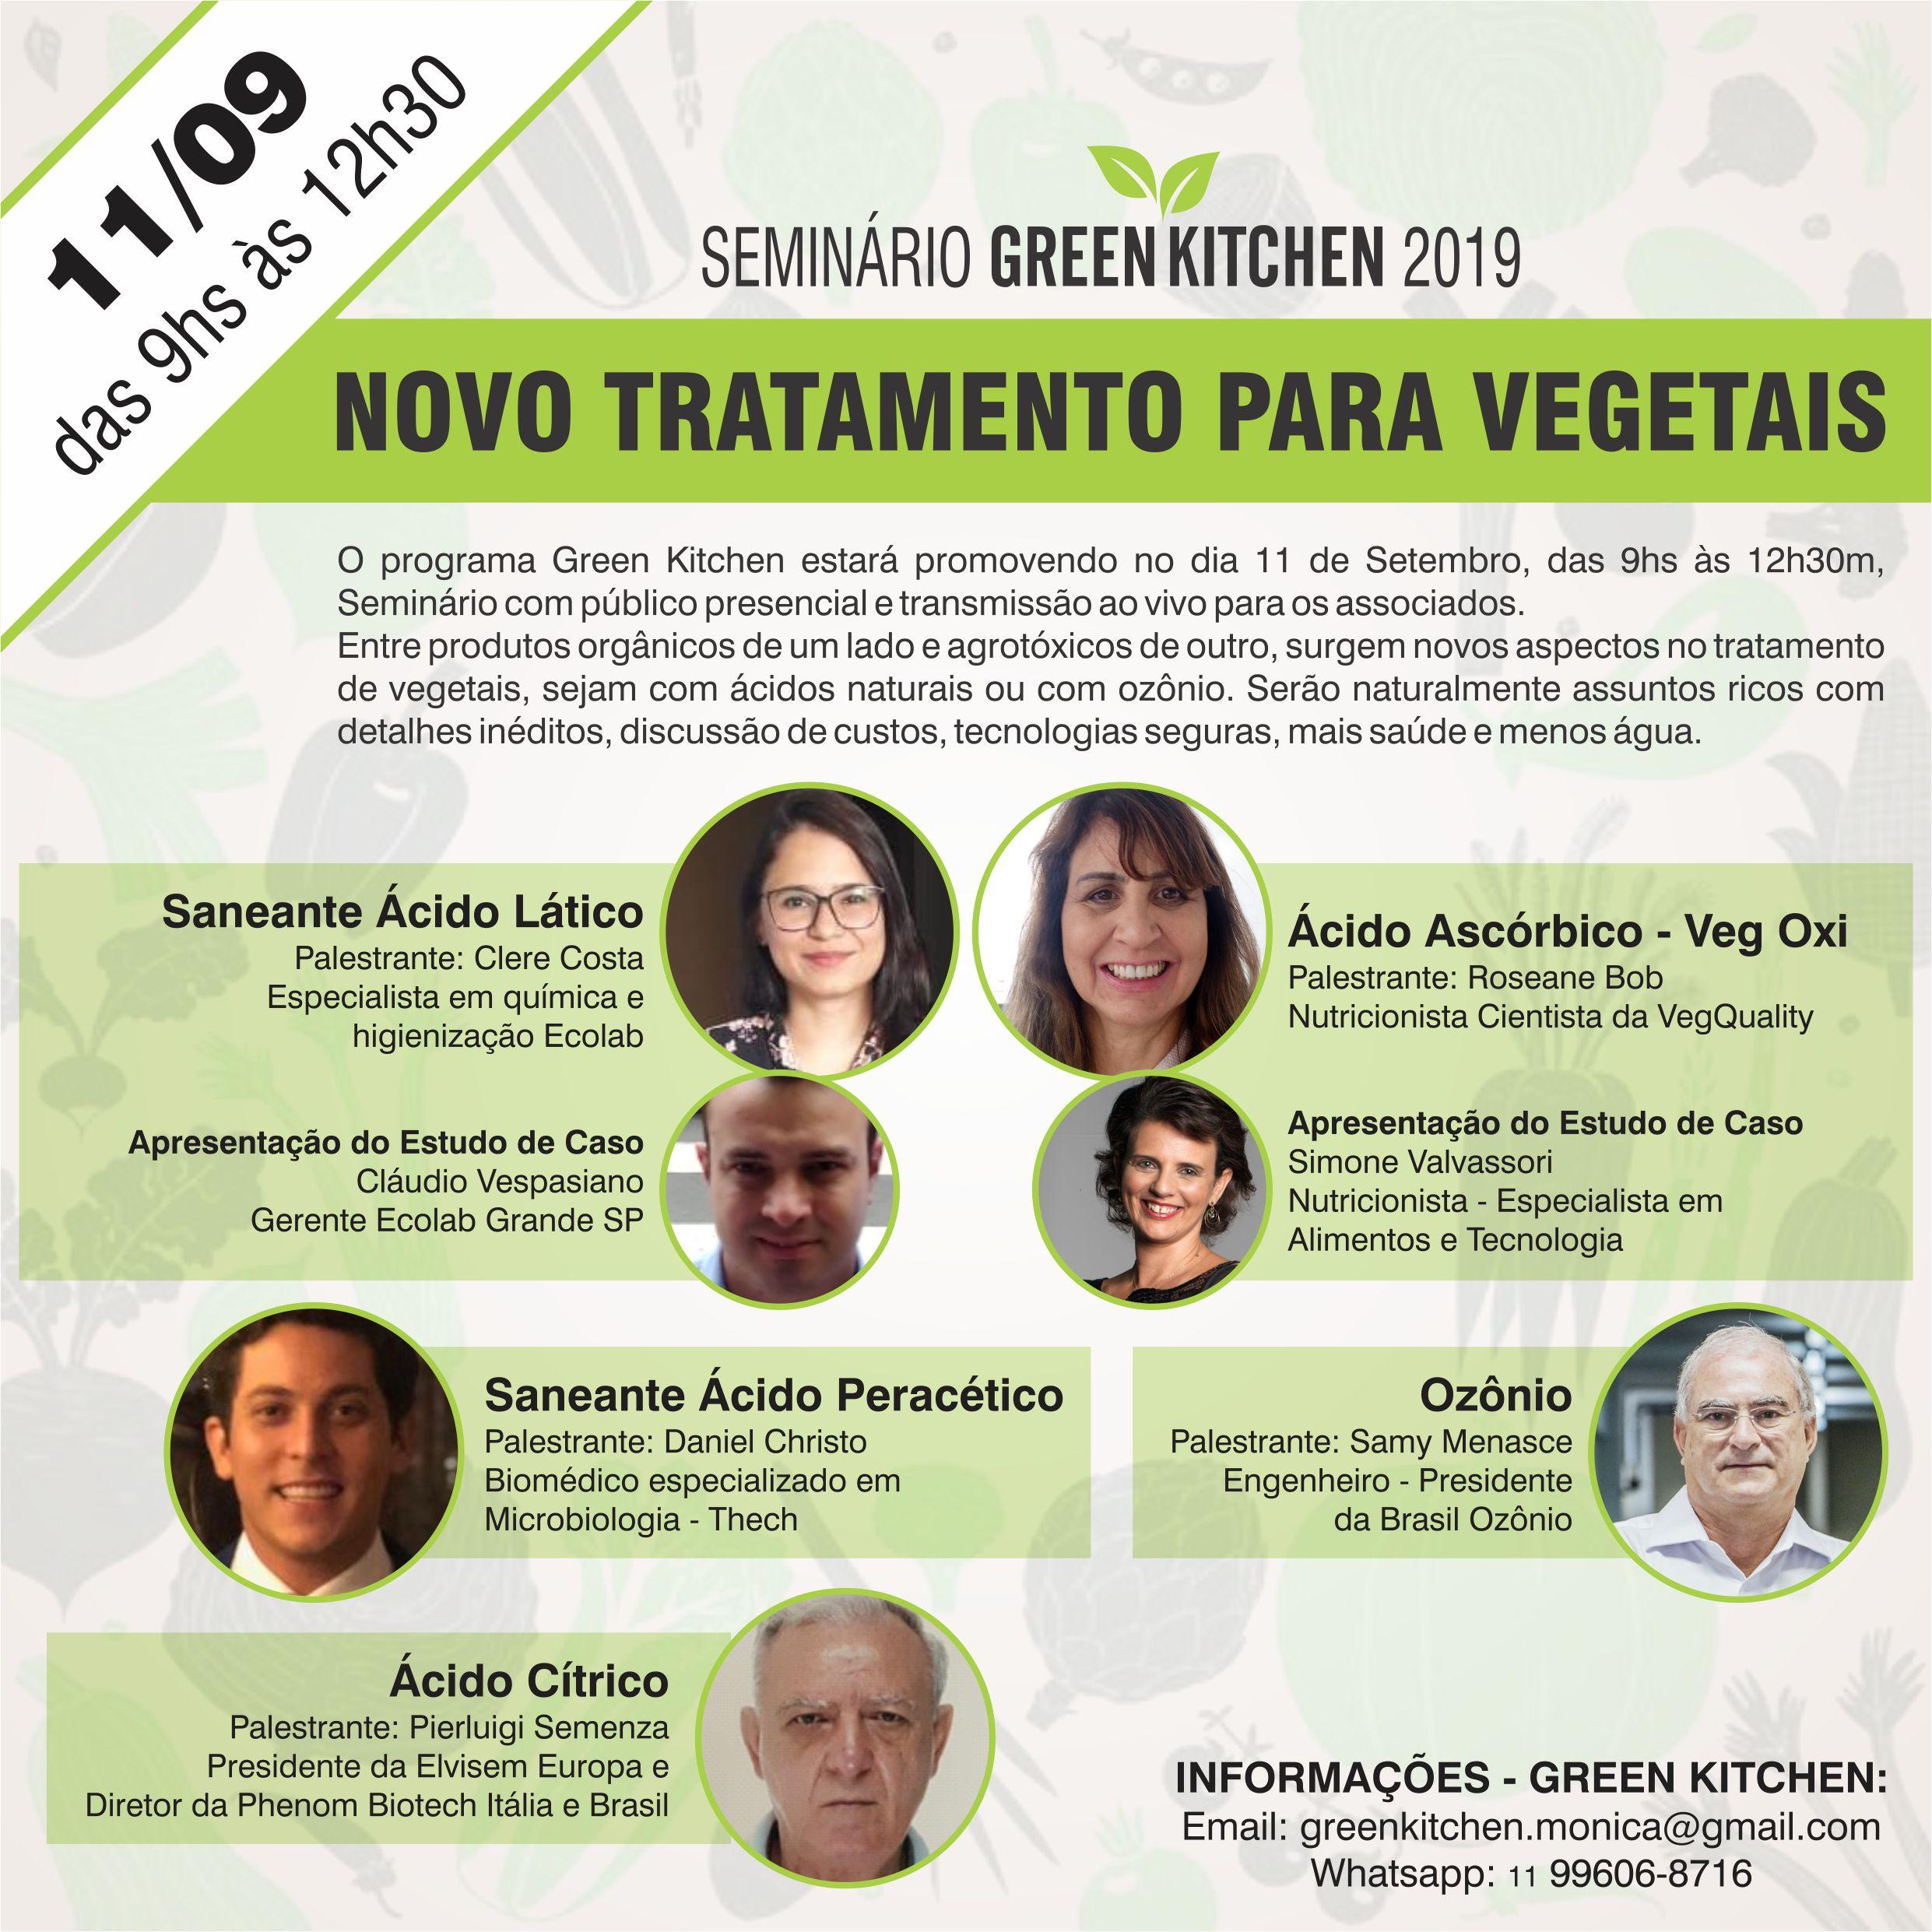 Seminário Green Kitchen 2019 (4)